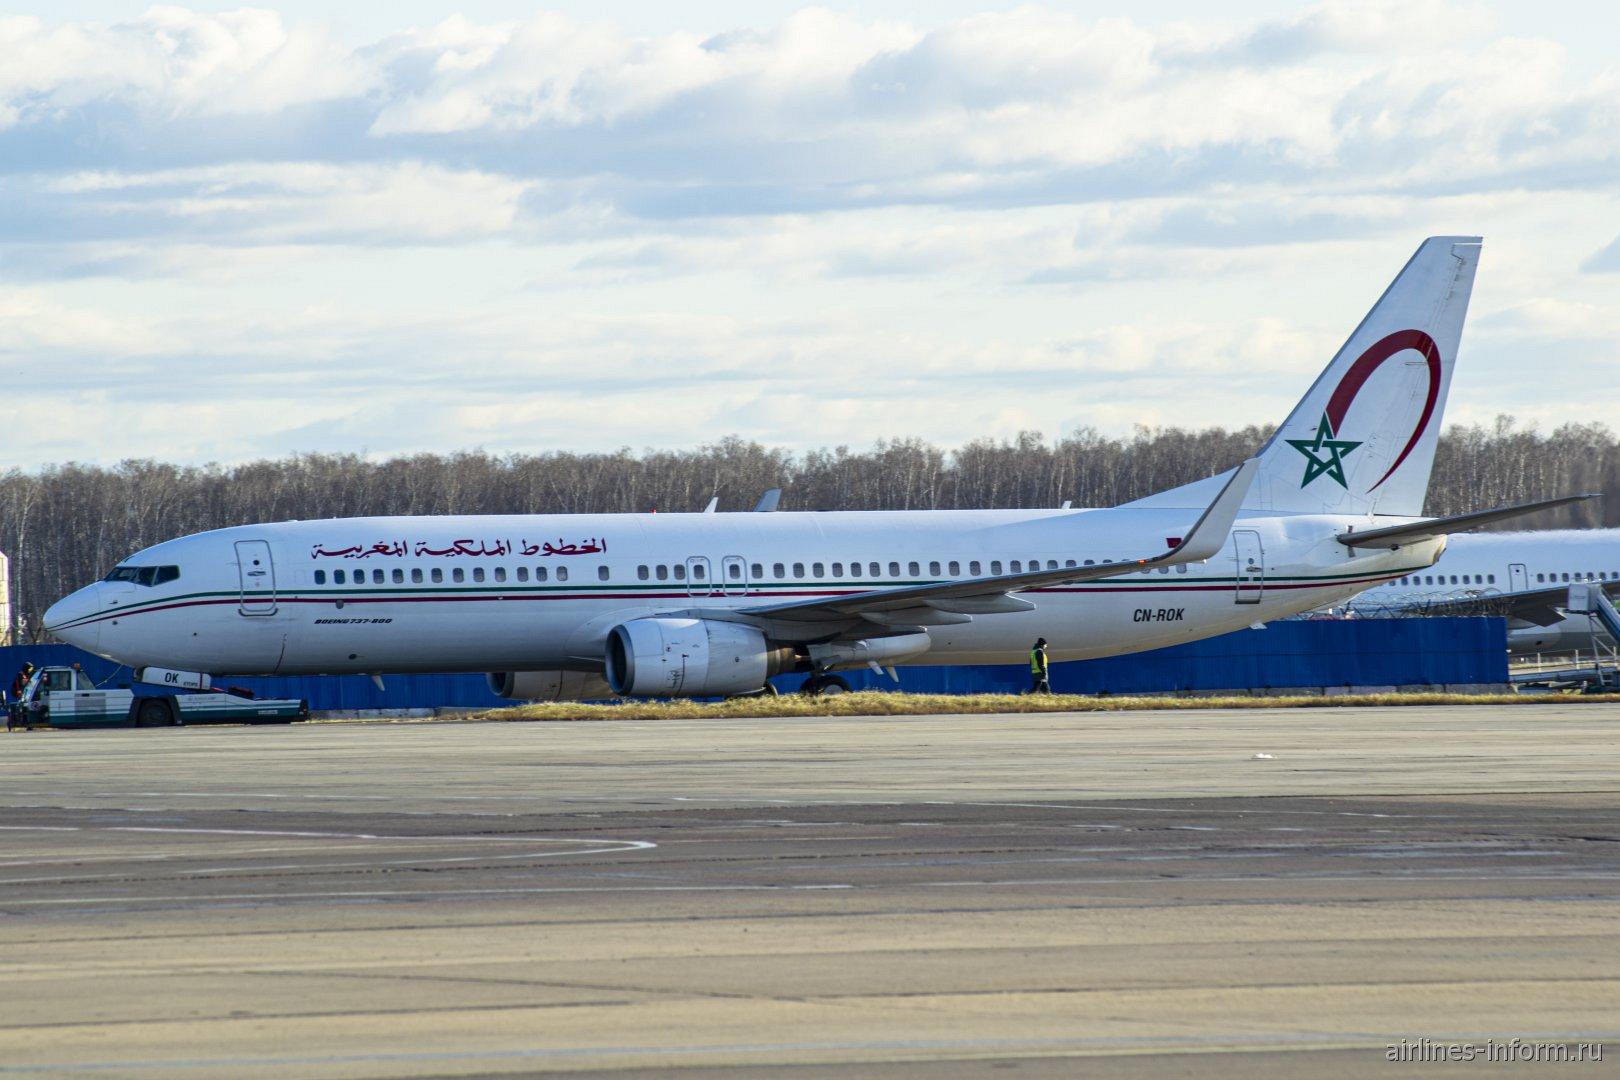 Боинг-737-800 CN-ROK авиакомпании Royal Air Maroc в аэропорту Домодедово